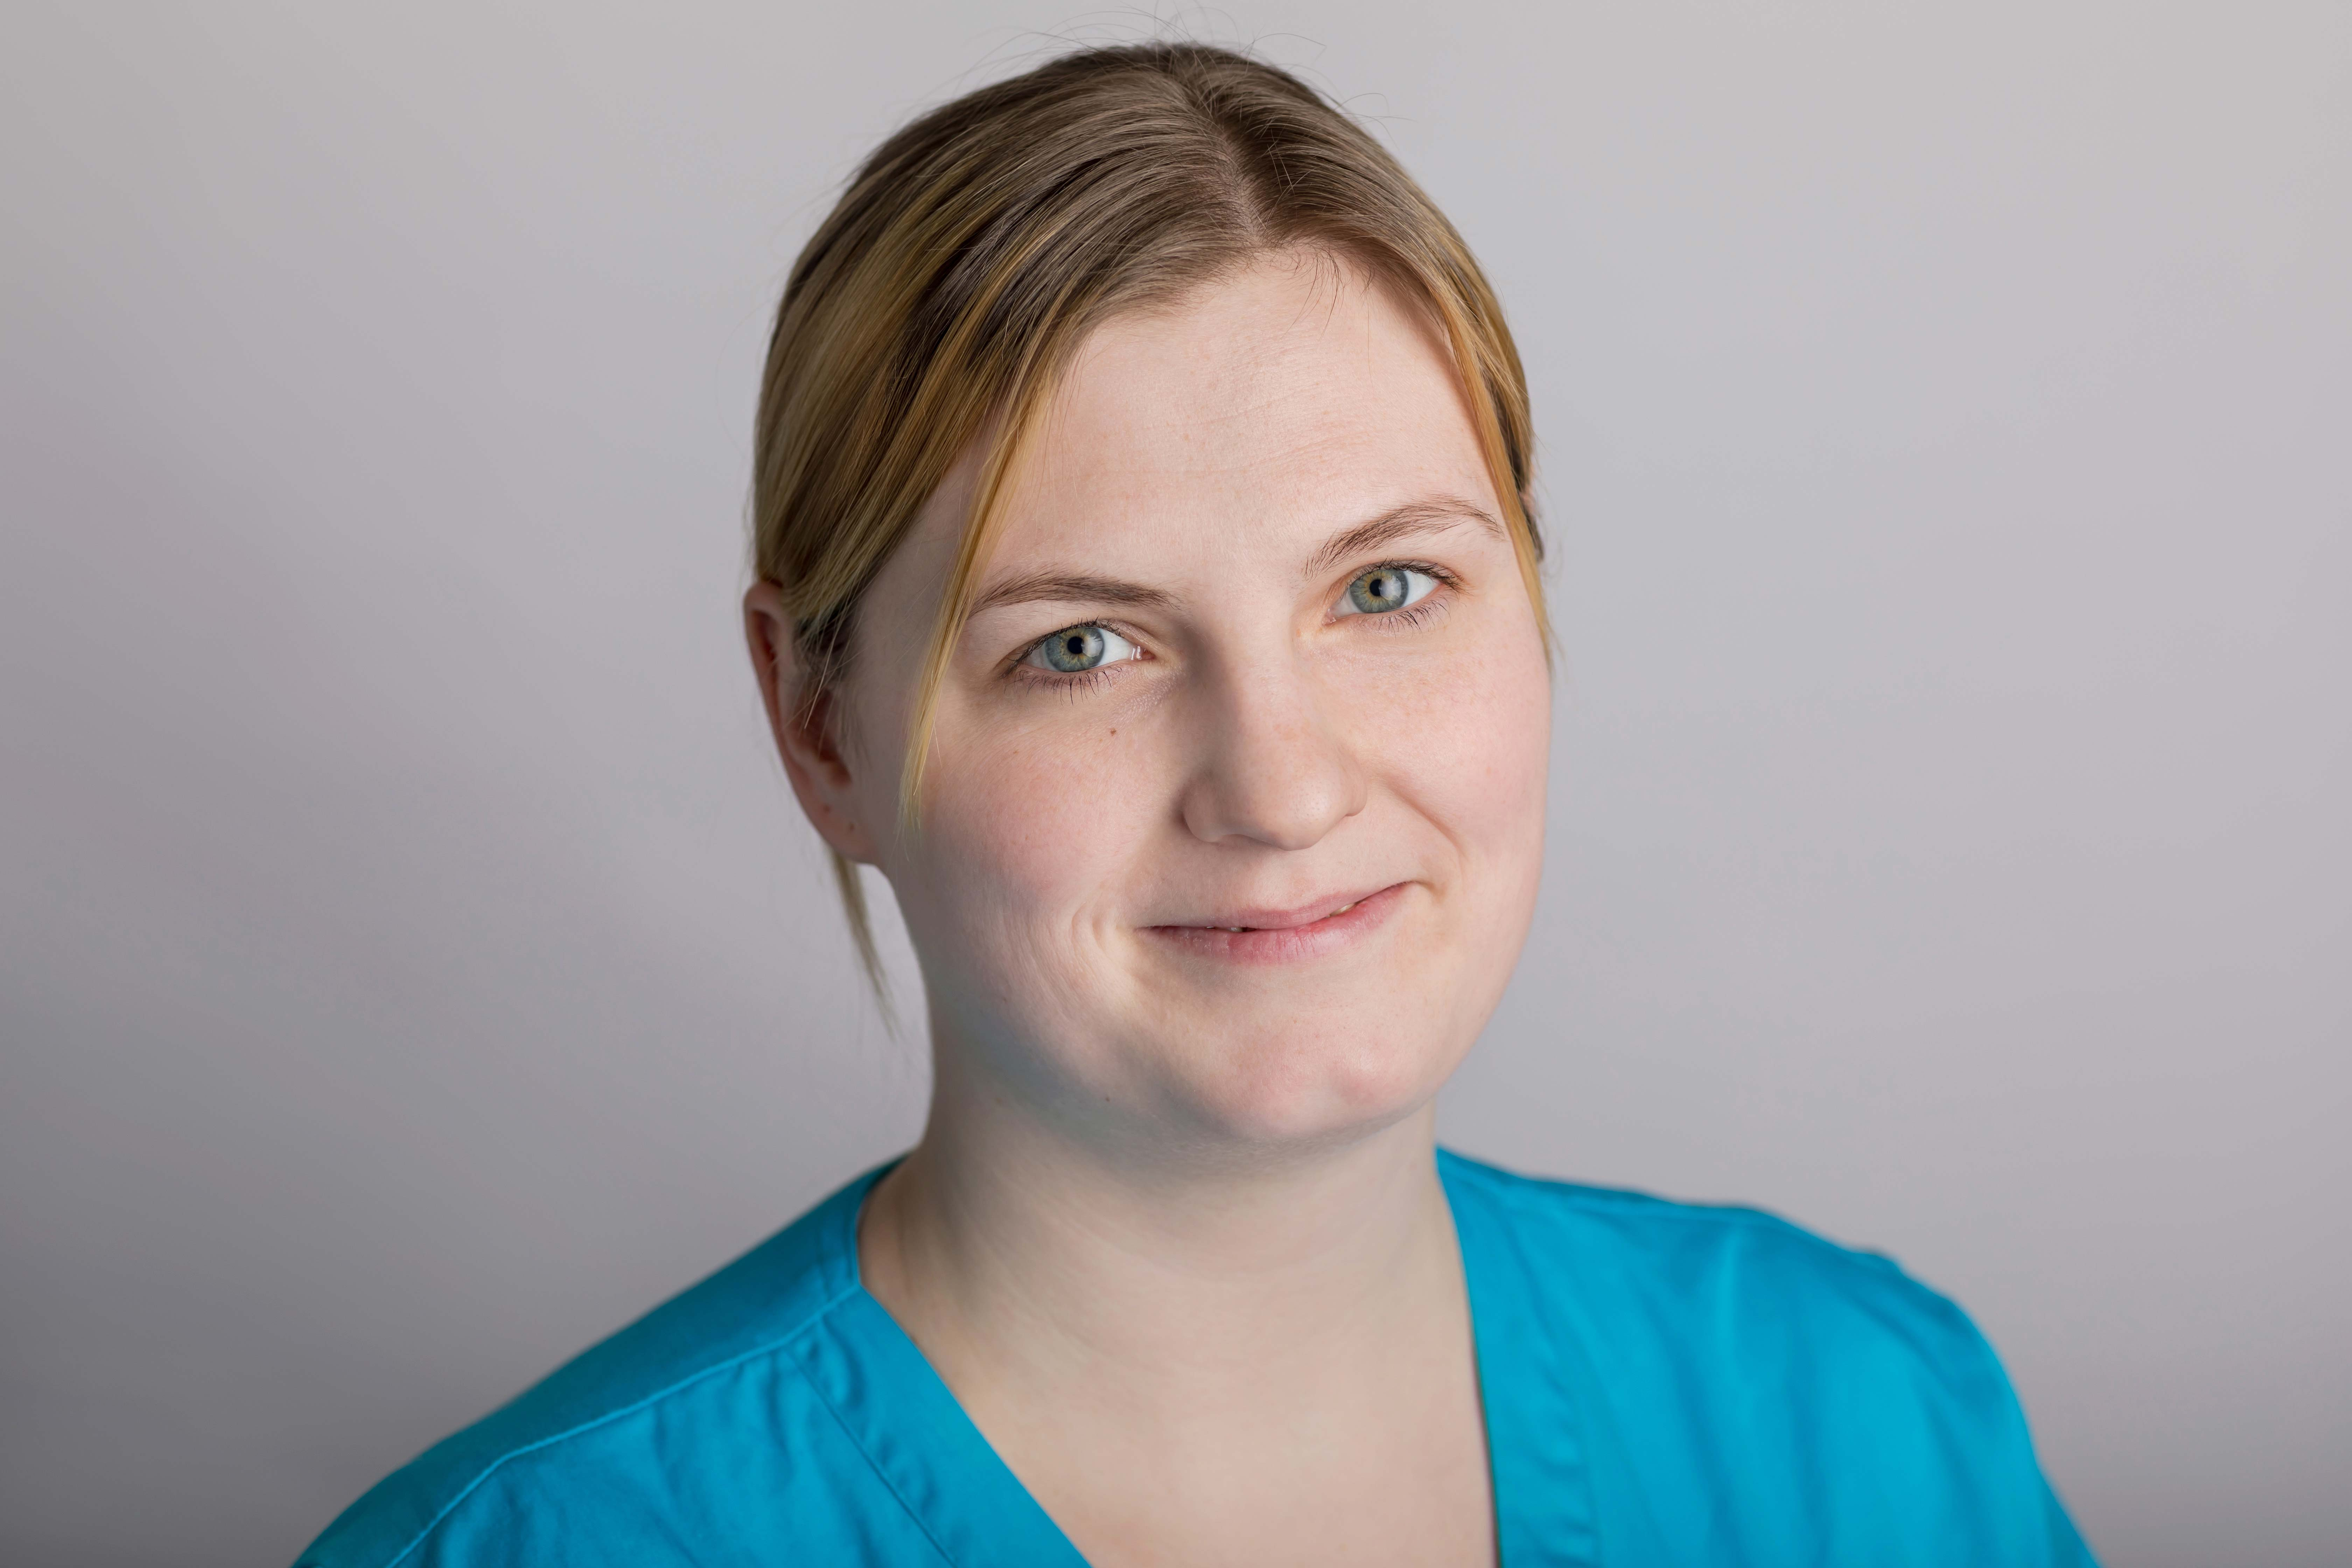 Janina Kröning